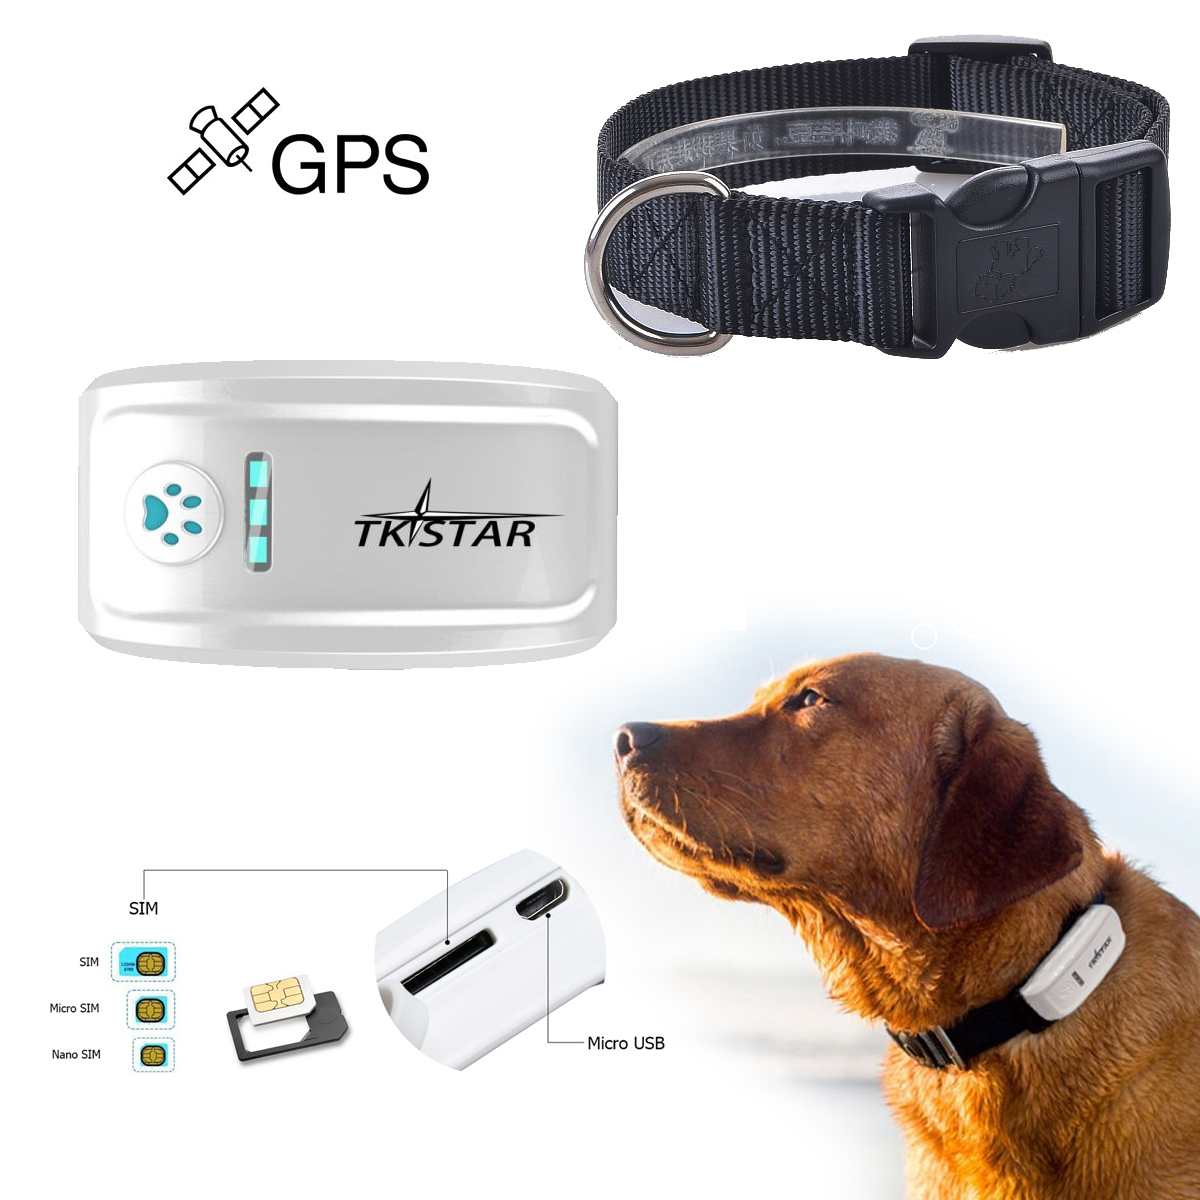 Waterproof TKSTAR Mini GPS Tracker Locator GSM GPRS Tracking System for Pets Dog Cat Old man PS013-SZ(China (Mainland))